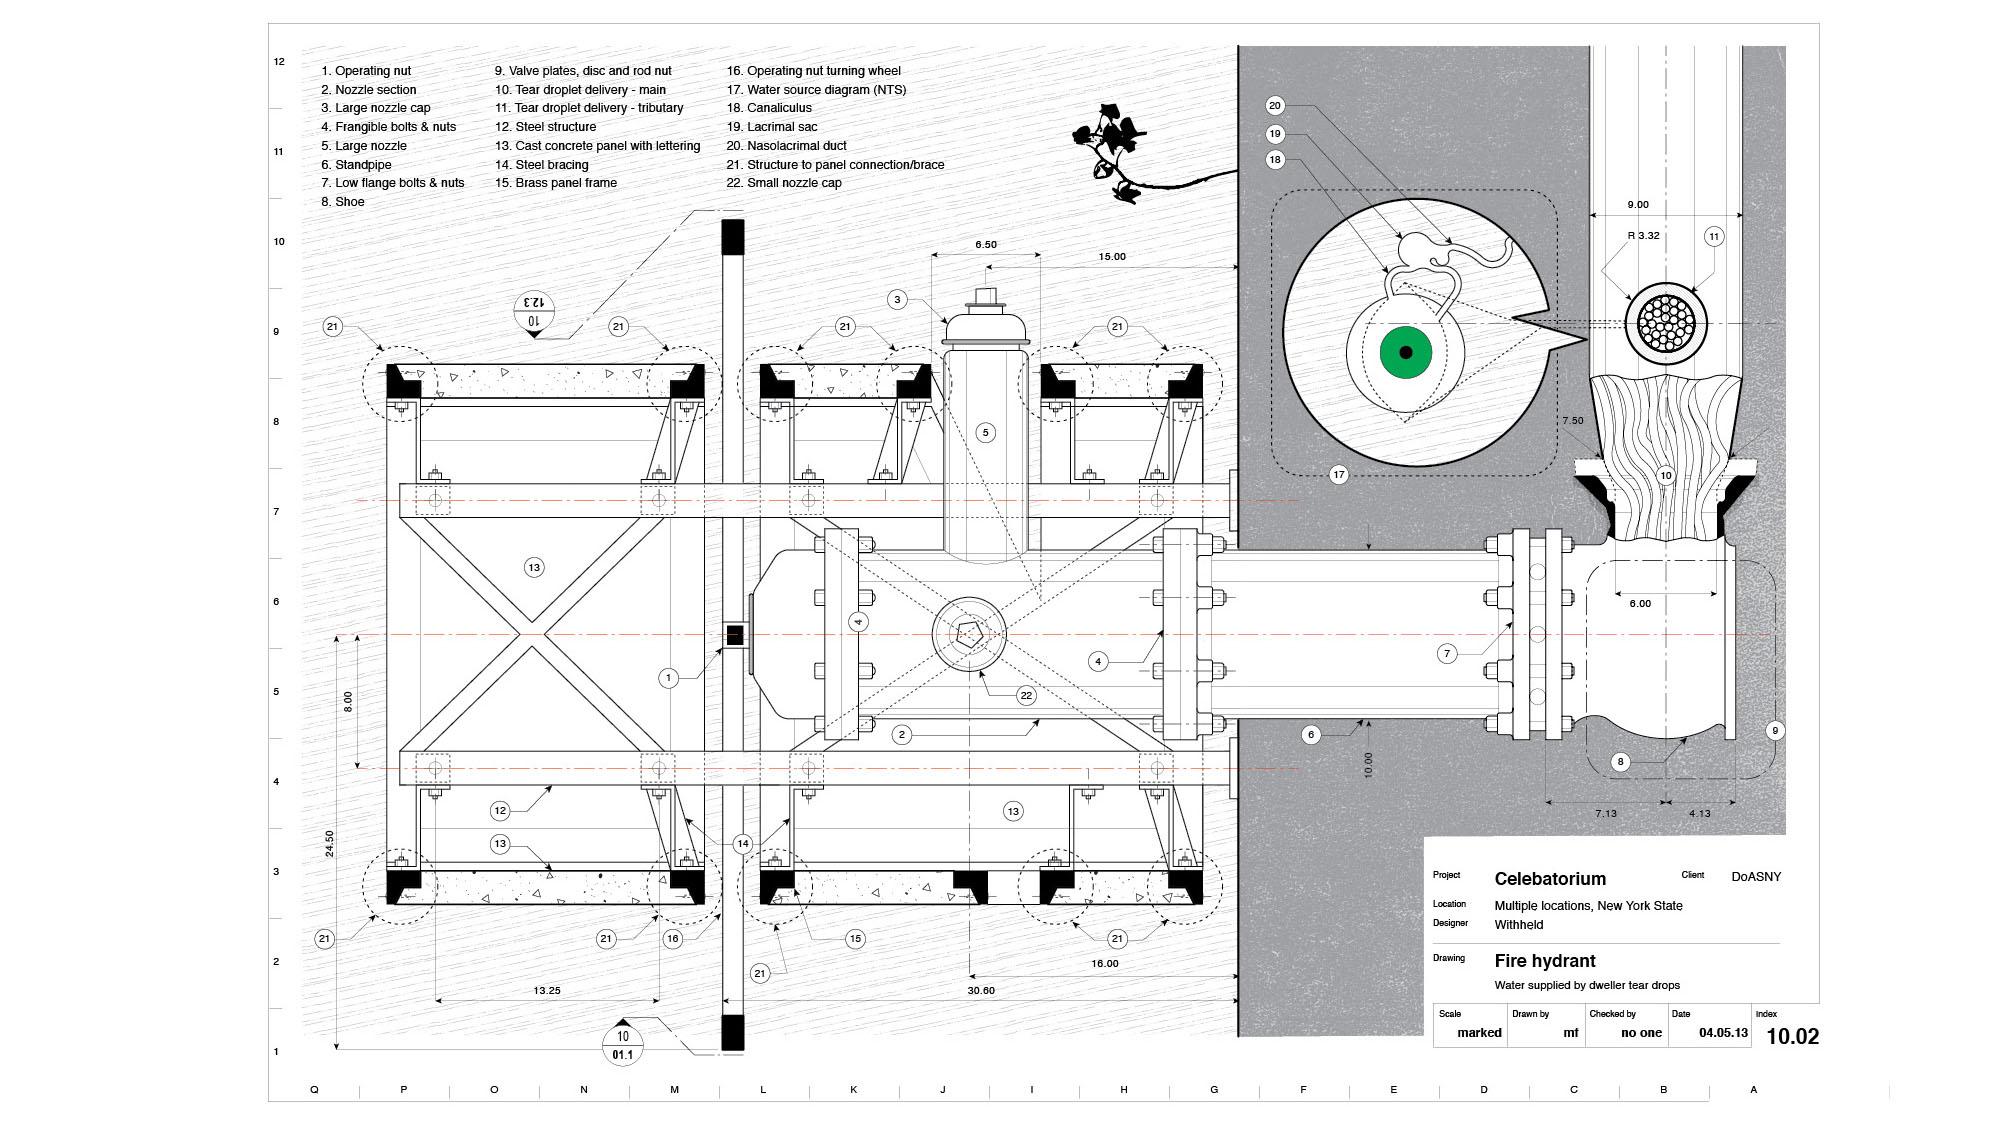 Celeb-web13.jpg